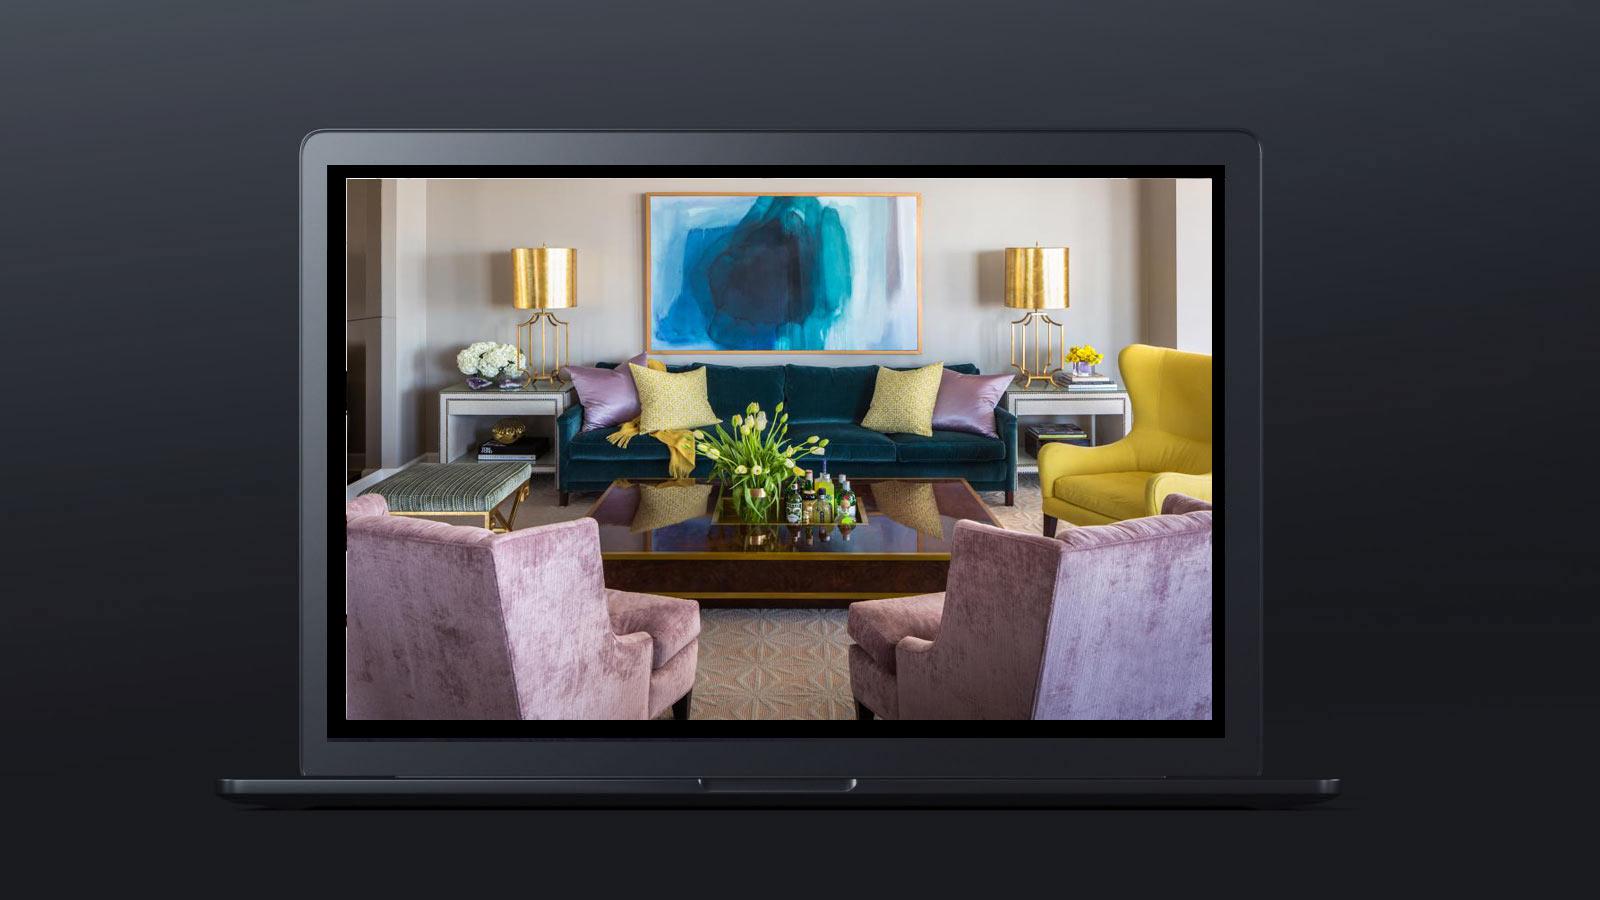 Design Color 20 - نقش رنگ و رنگ آمیزی در دکوراسیون داخلی